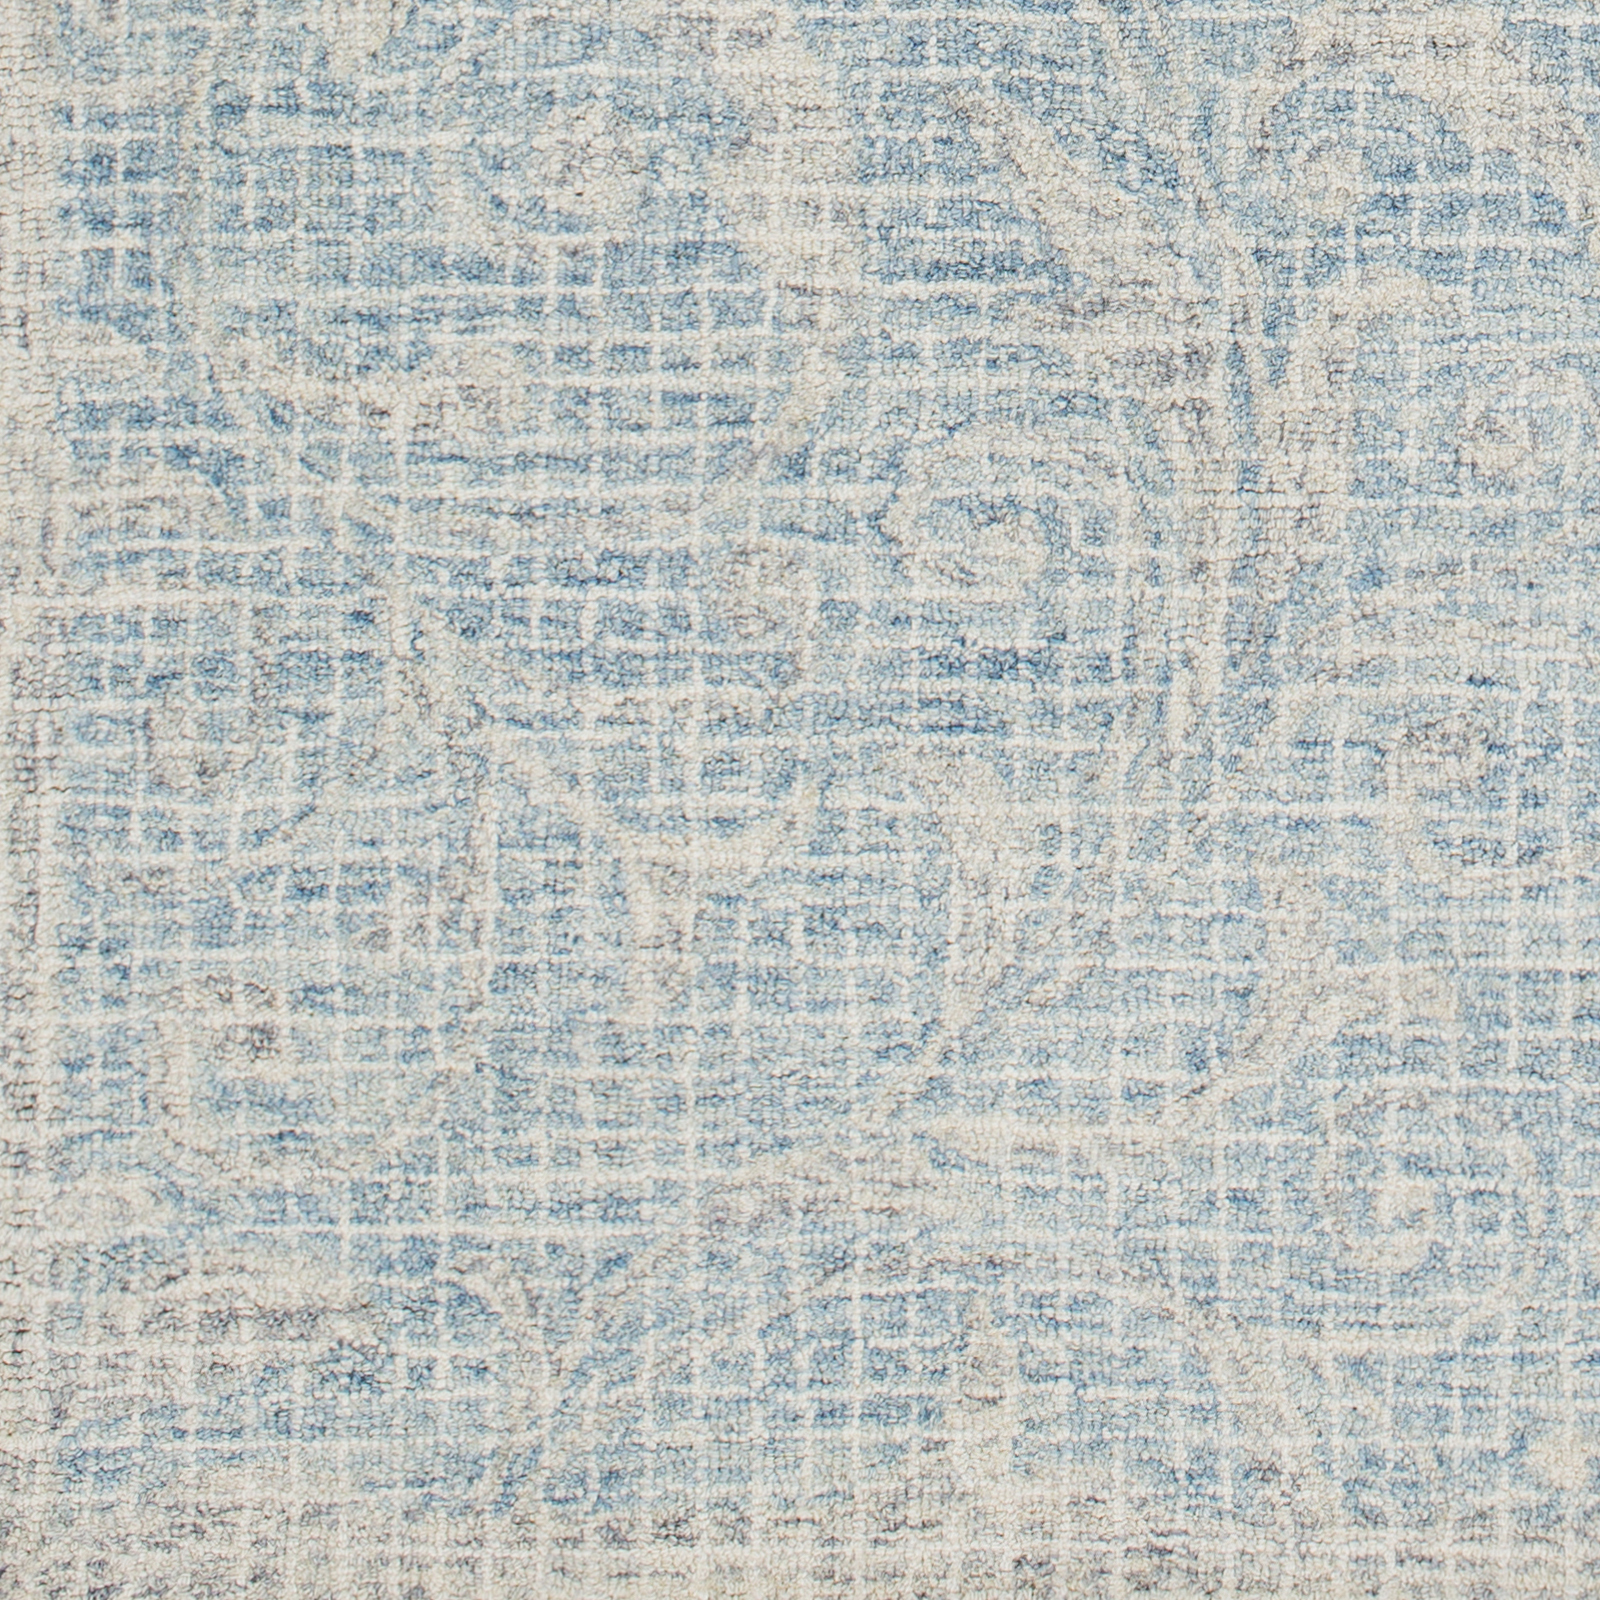 Piastrella - 2' x 3' Area Rug